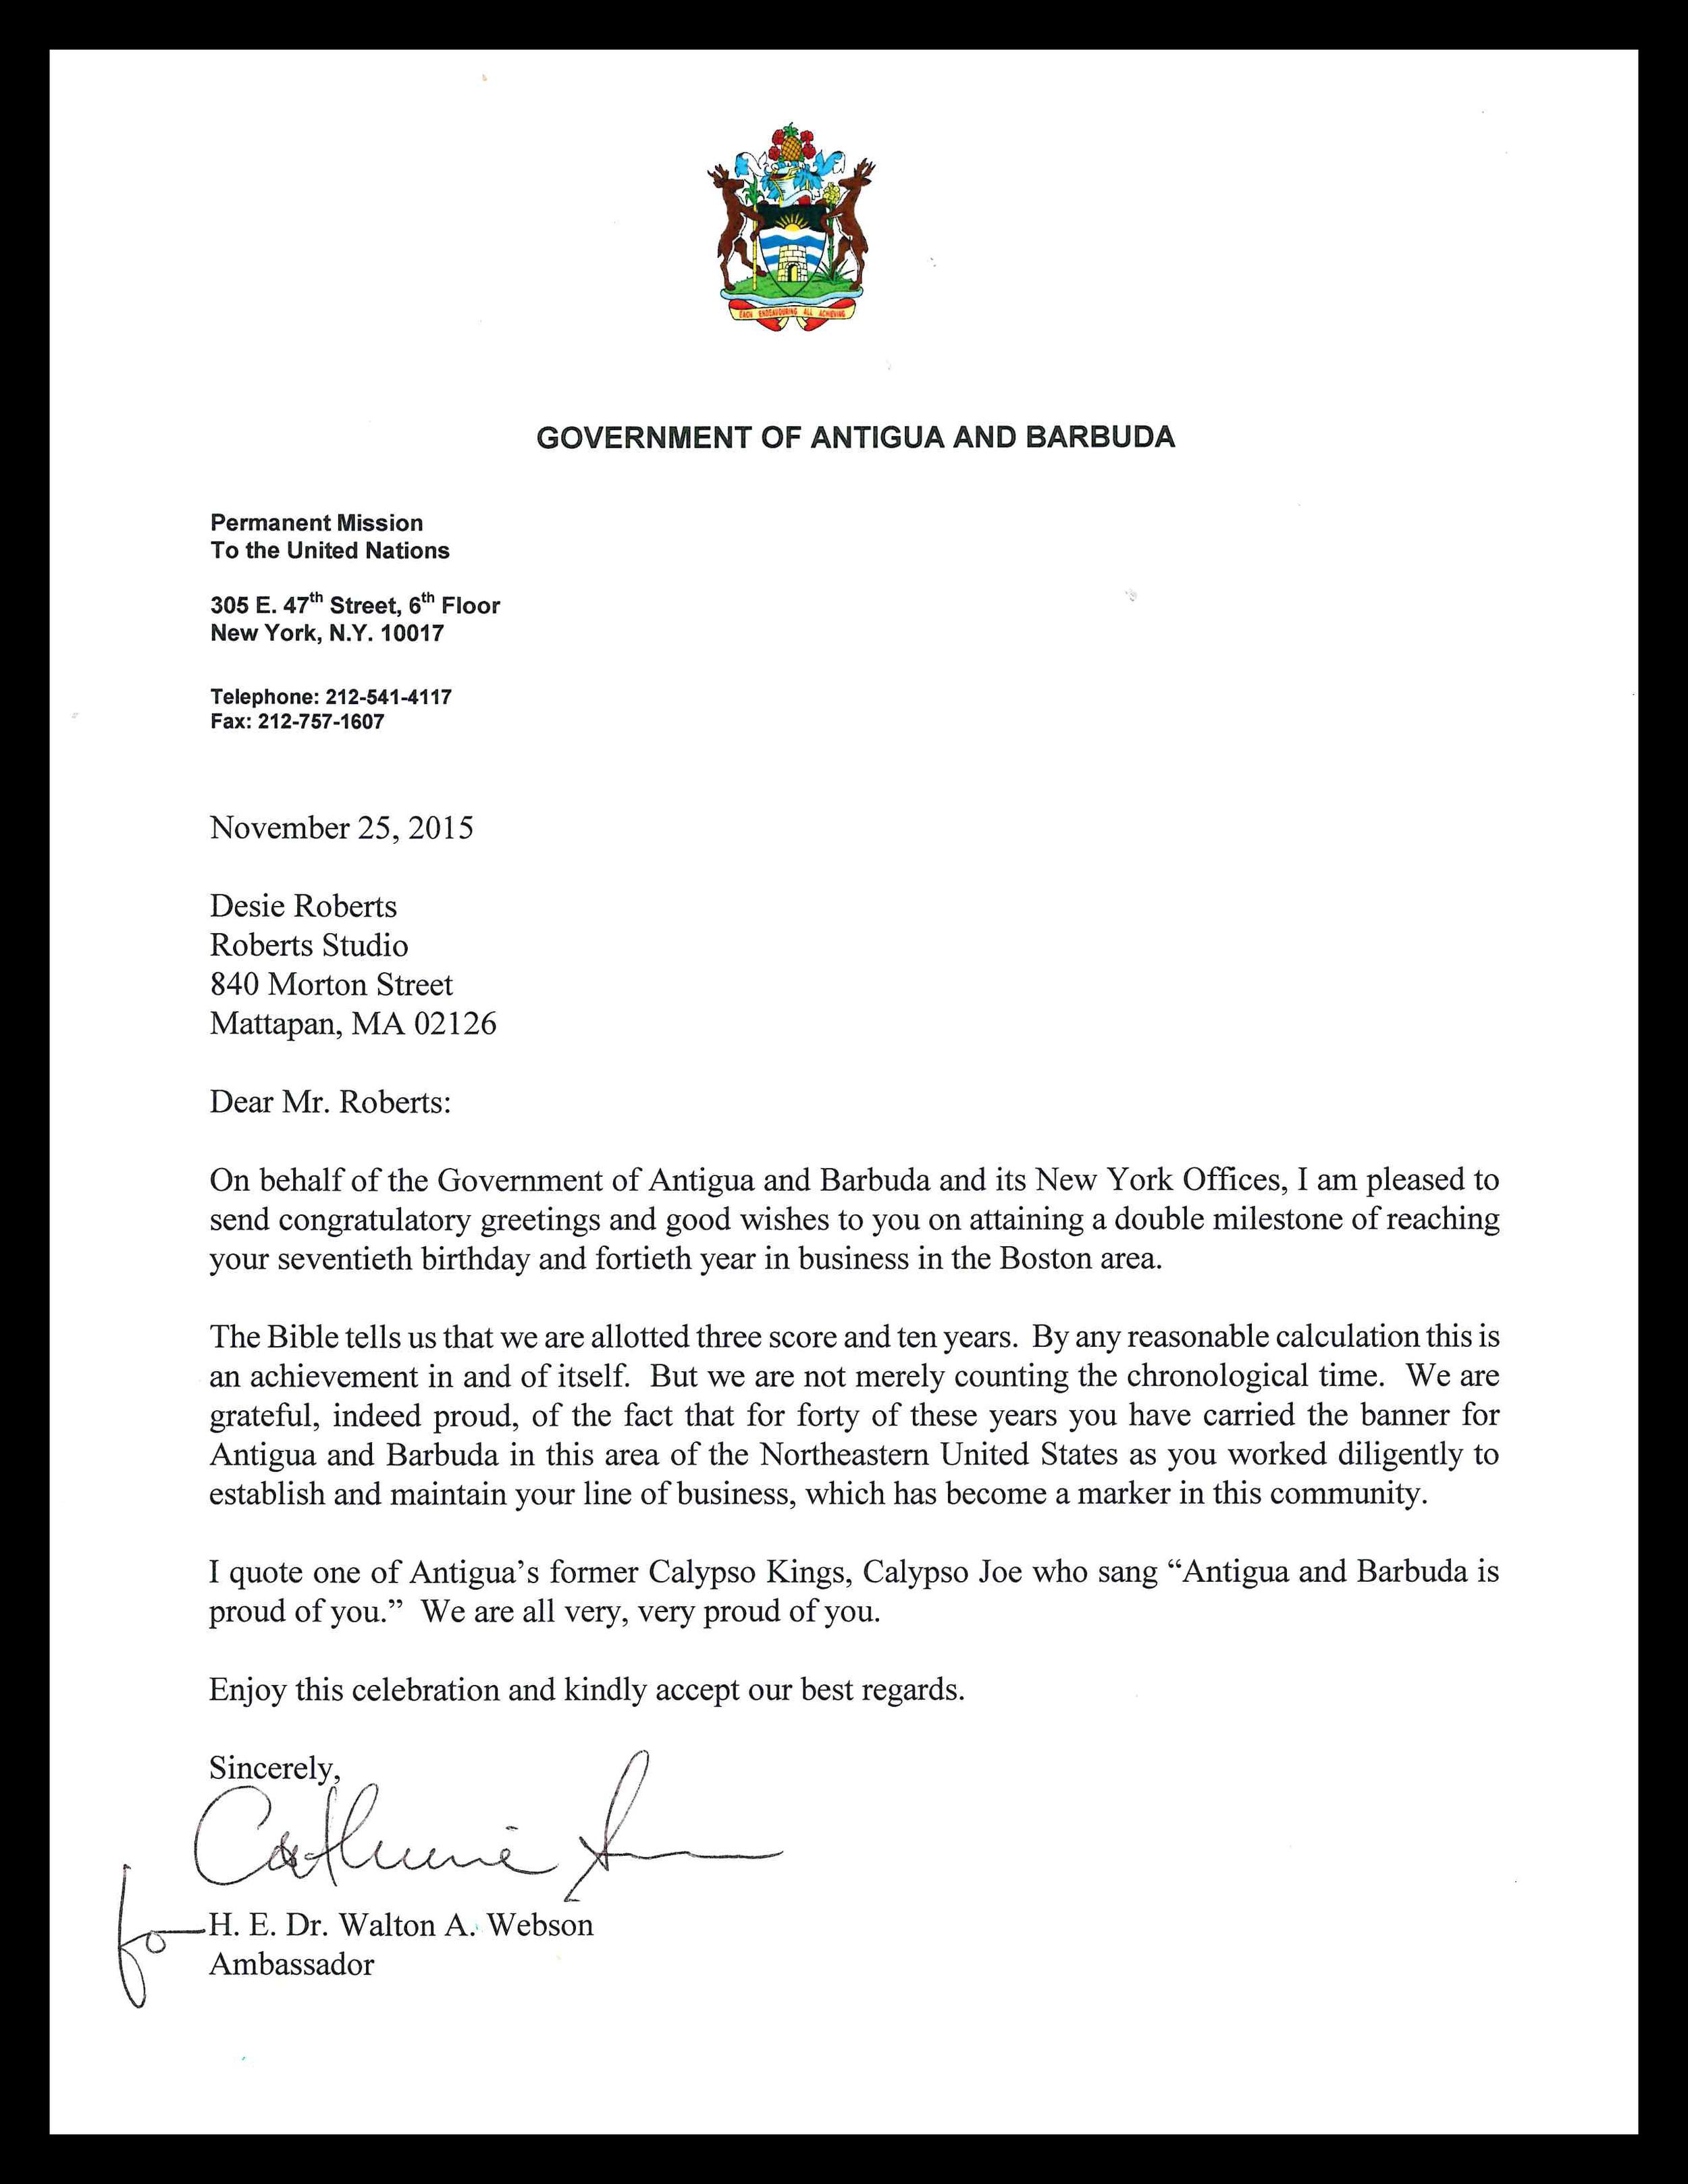 Citation from Antigua and Barbuda.jpg